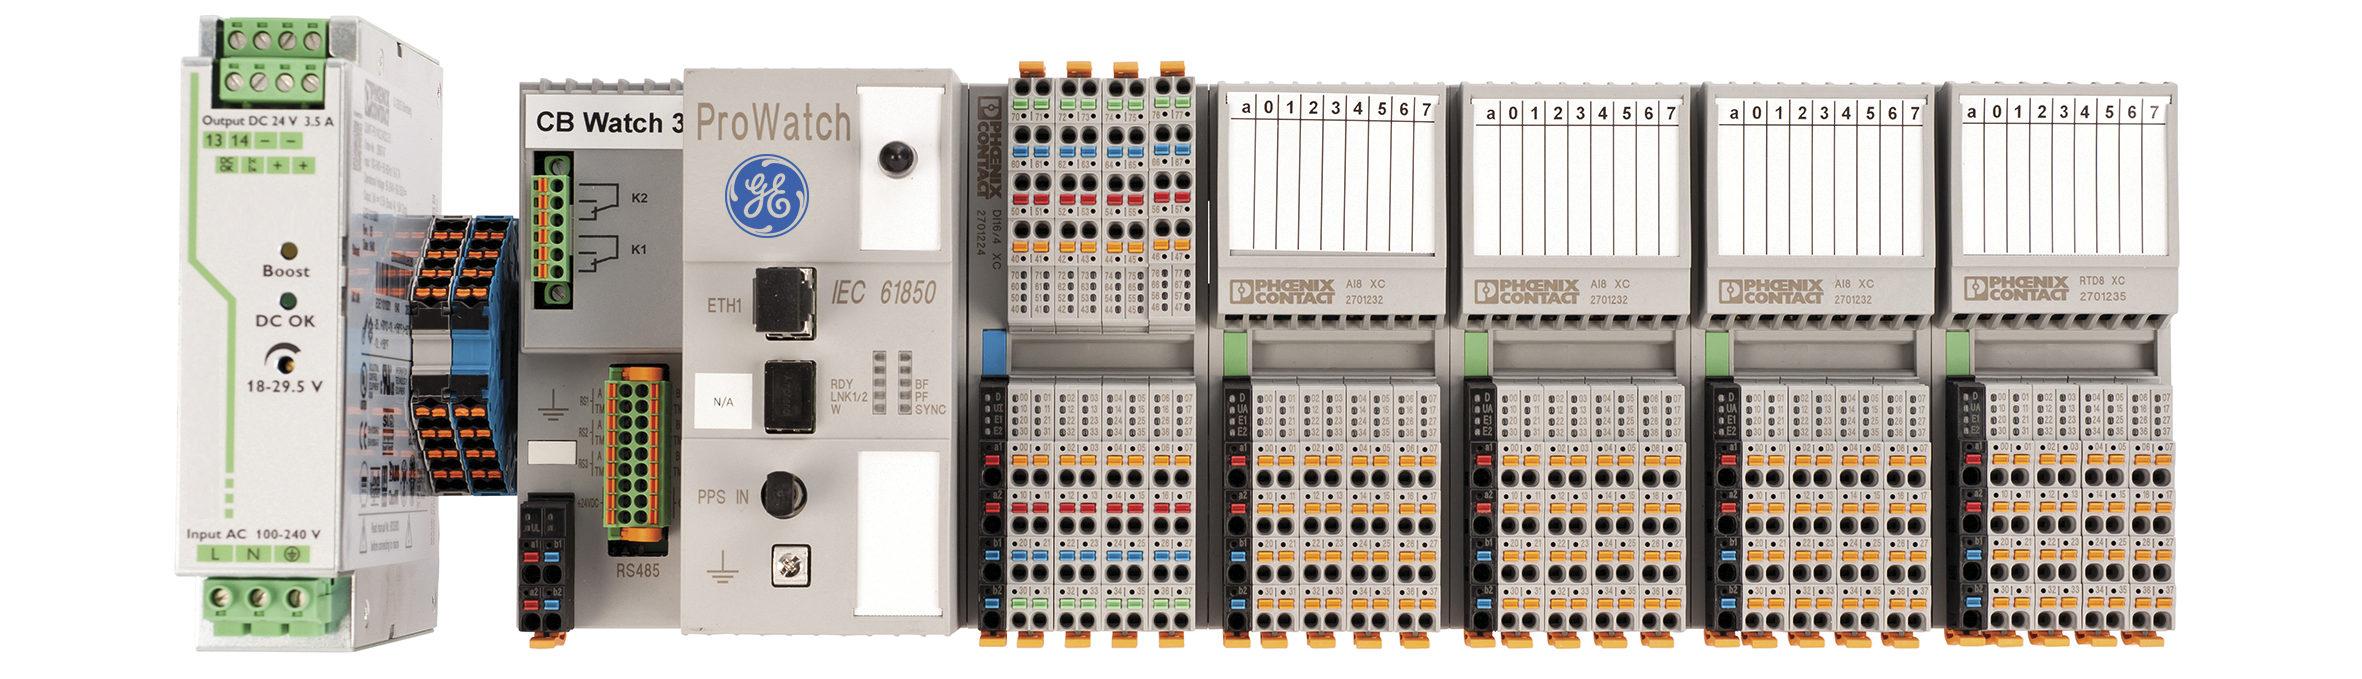 equipo-monitoreo-interruptores-1